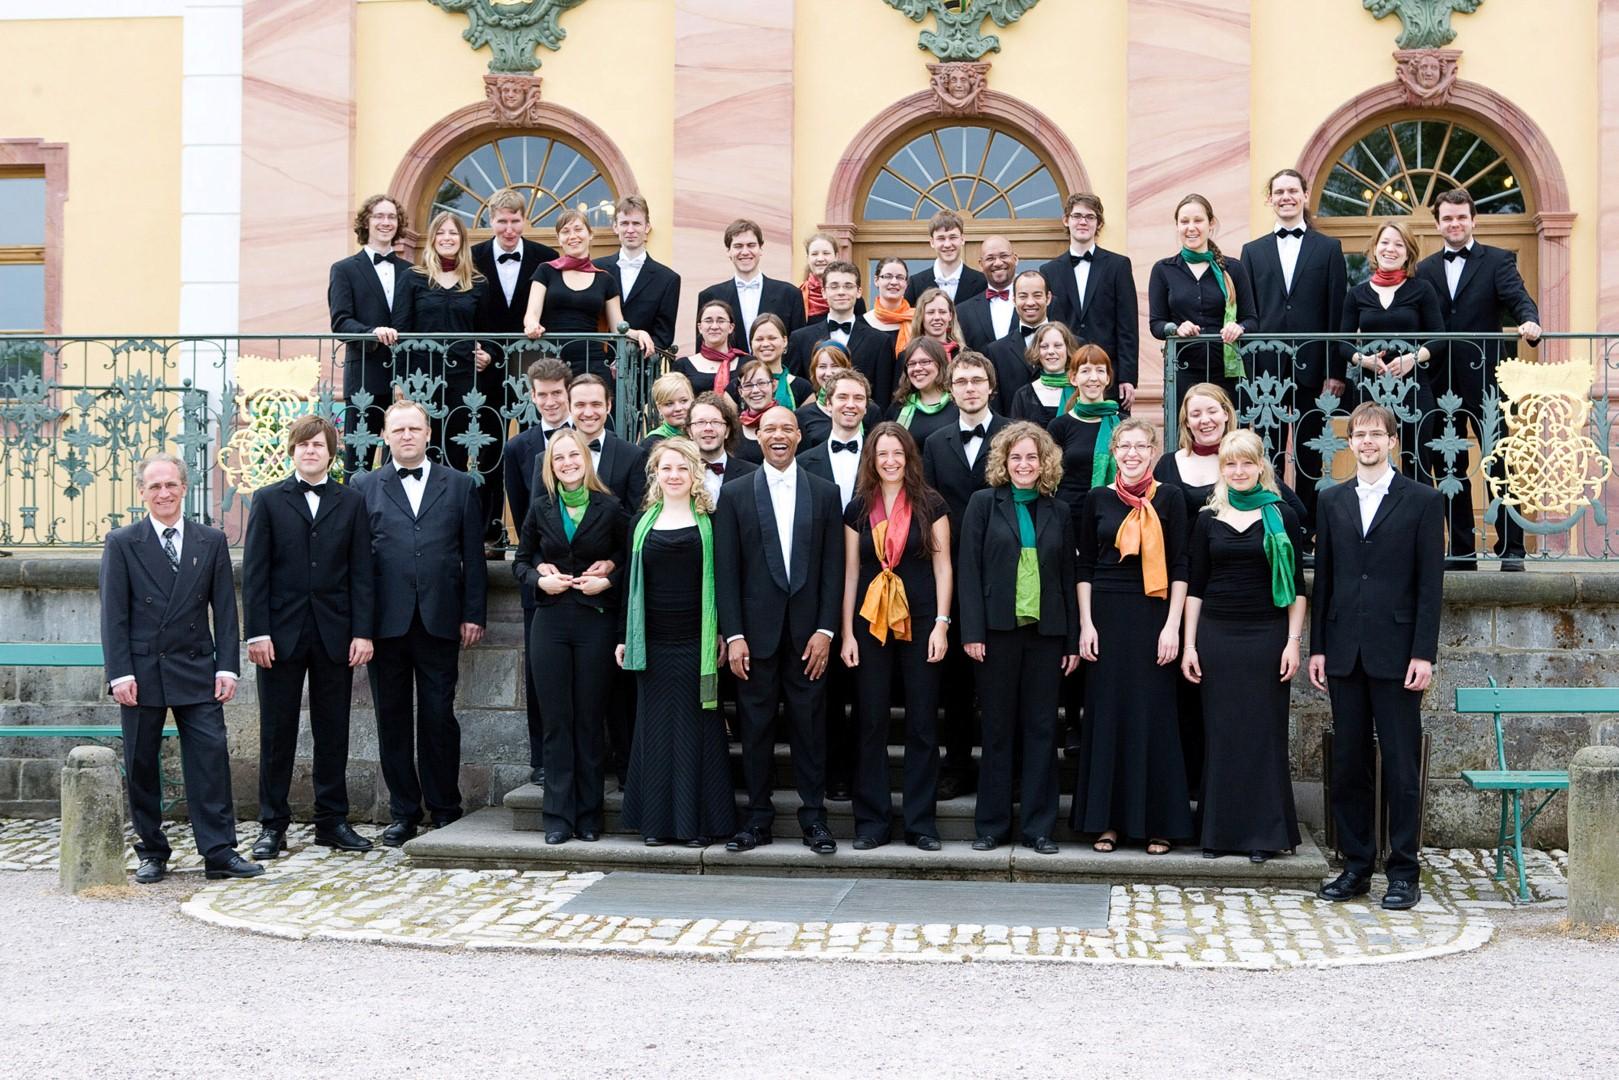 Хор академии музыки им. Ференца Листа из Веймара, Германия. Фото: Guido Werner